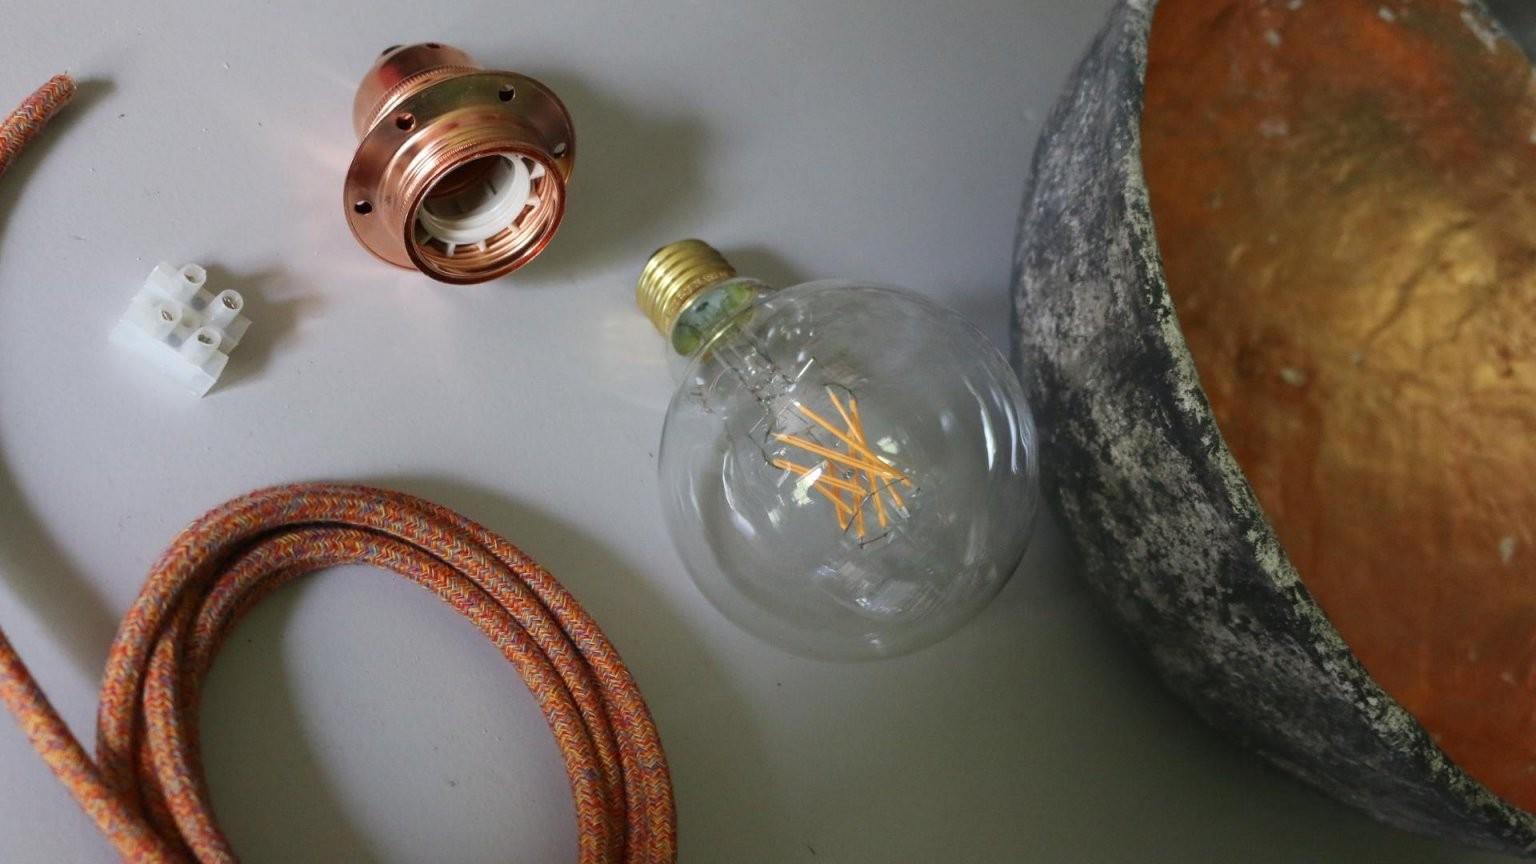 ᐅᐅ Vintage Lampen Selber Bauen  Shop  Anleitungen  Diy Ideen von Lampenschirm Selber Machen Material Bild